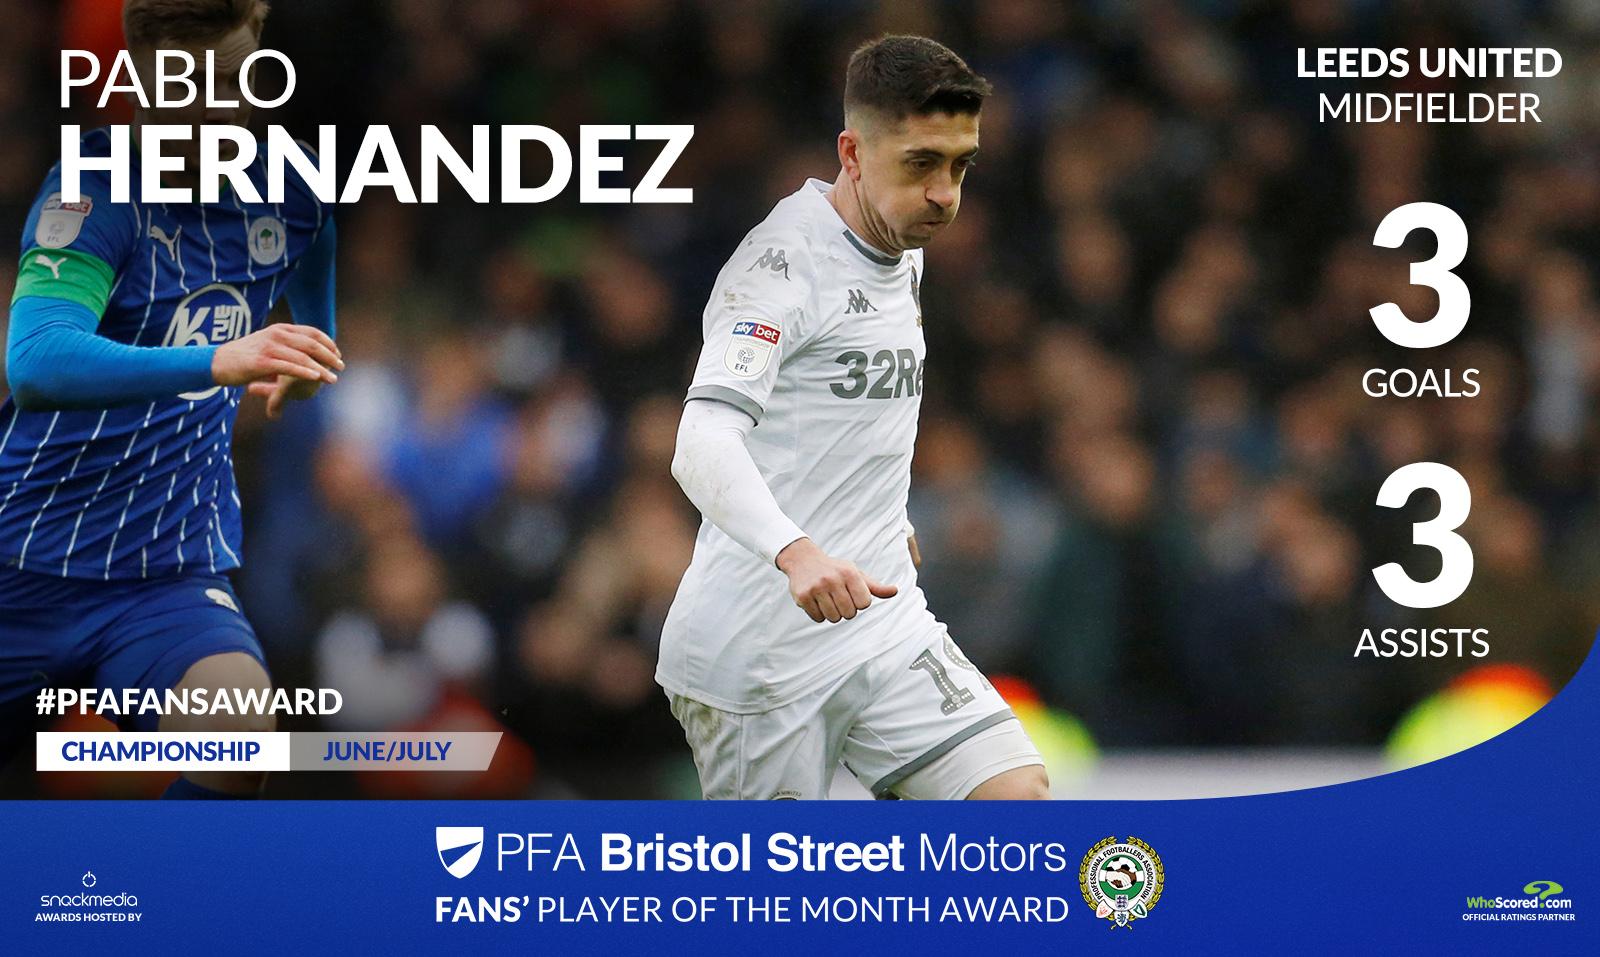 Leeds United's Pablo Hernandez Wins PFA Bristol Street Motors Fans' Player Award